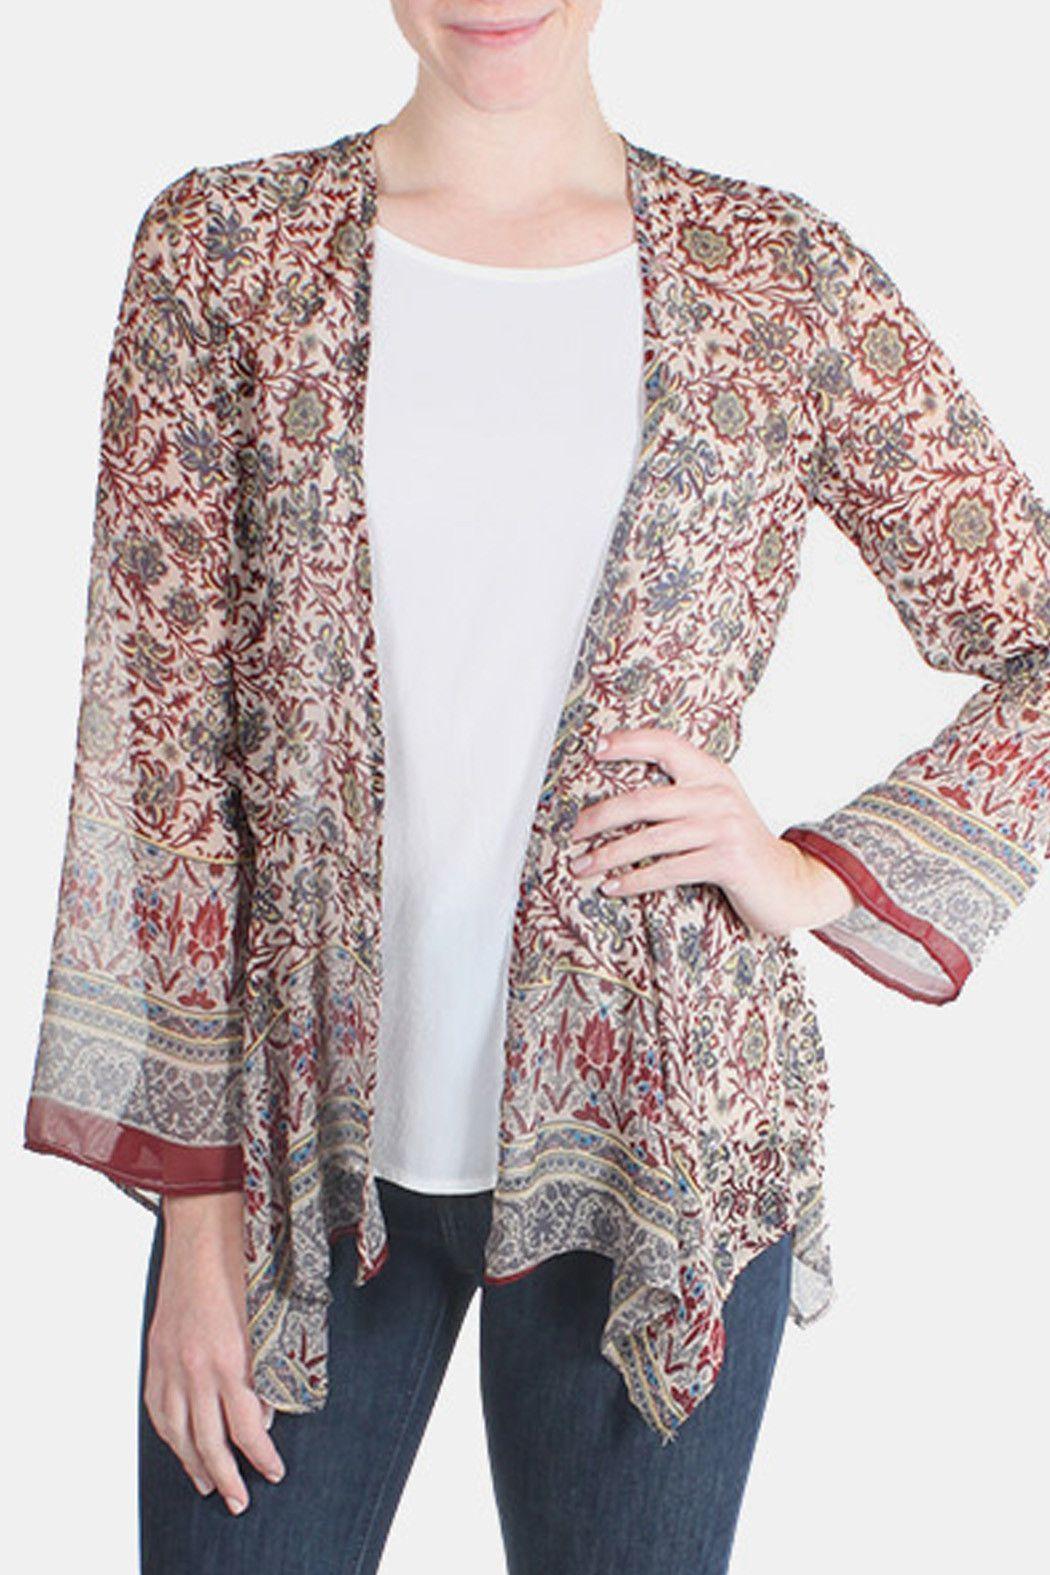 Bohemian Floral Kimono Cardigan in Maroon | Products